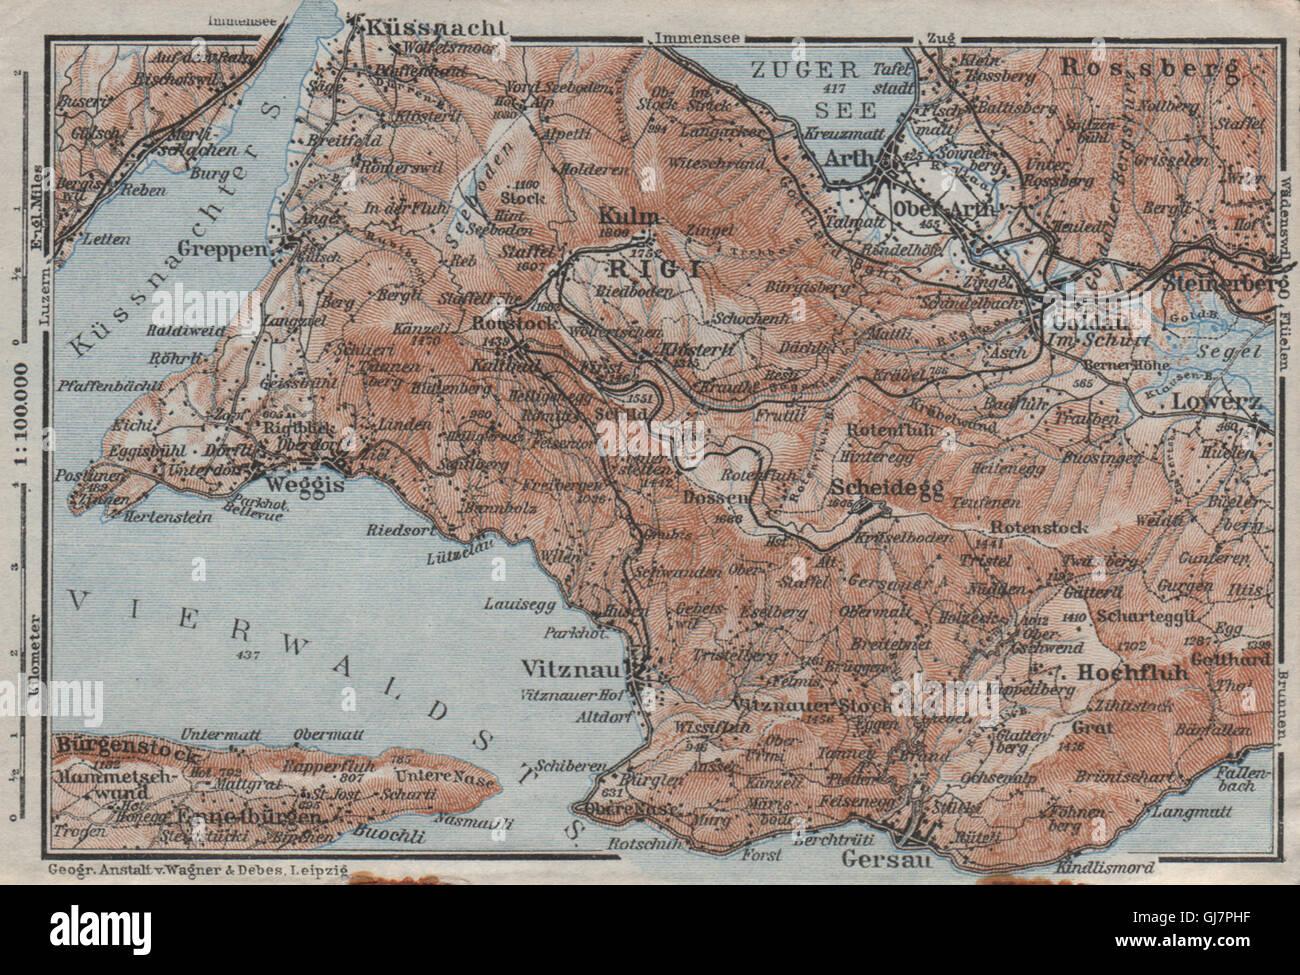 The Rigi Lowerz Arth Gersau Kussnacht Topo Map Switzerland Stock